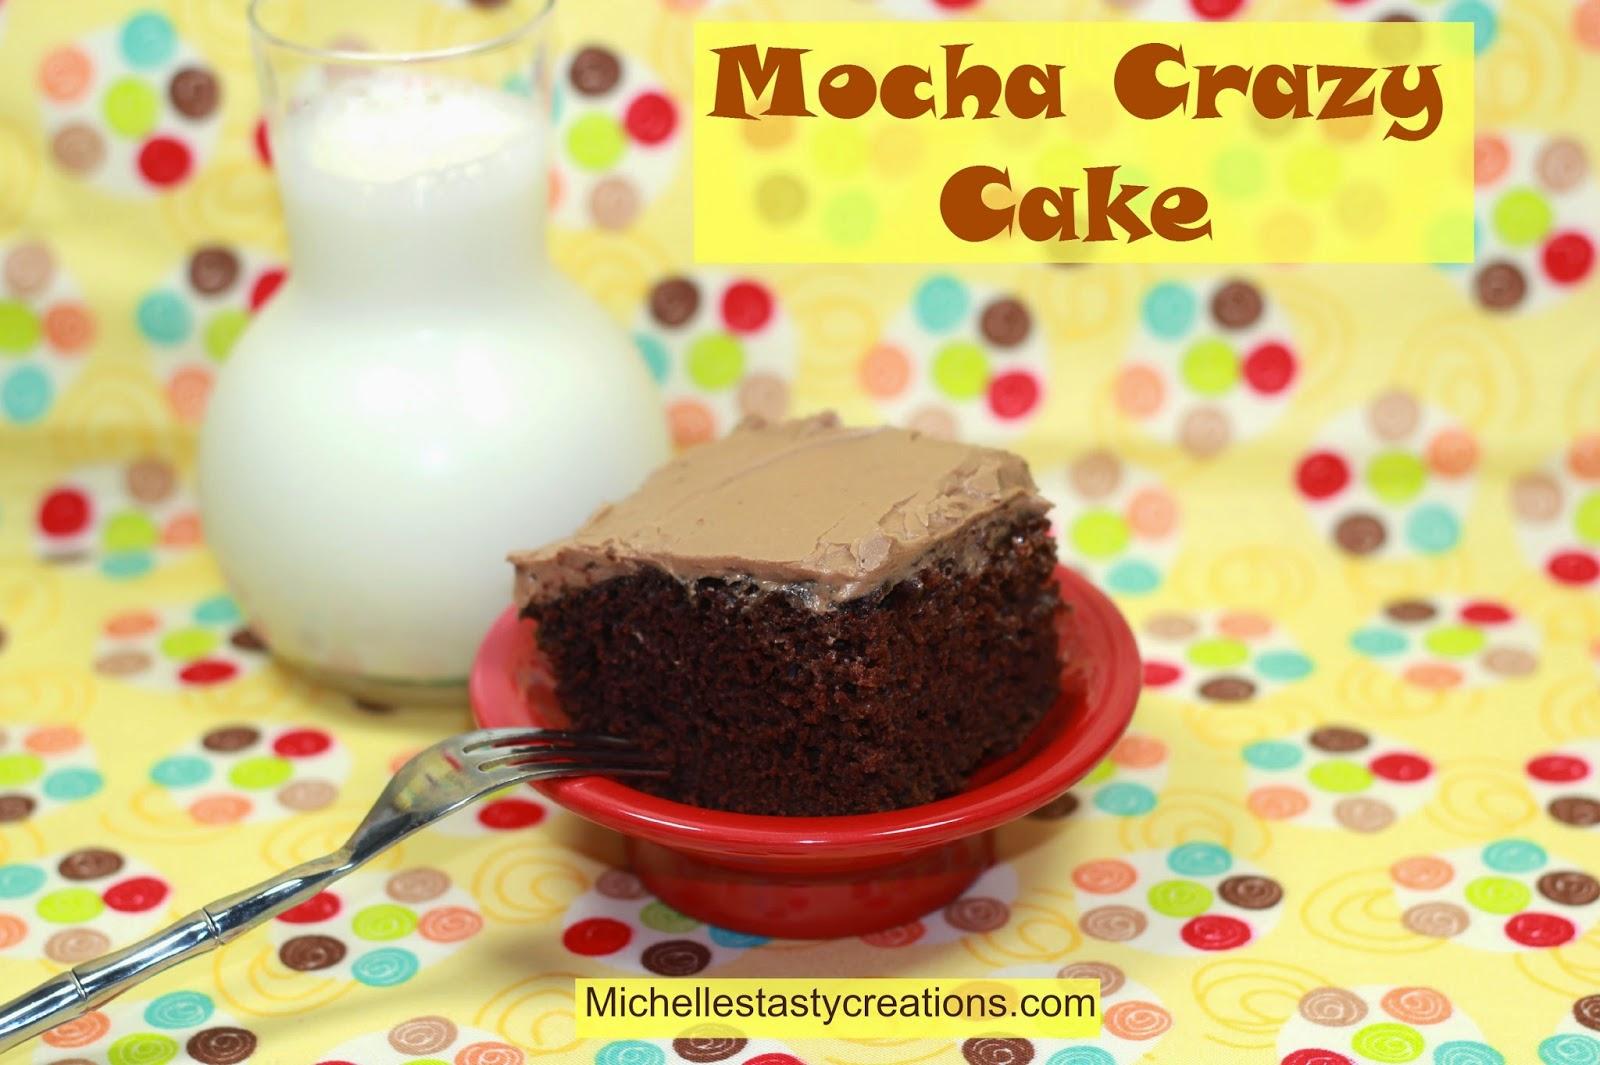 Michelle's Tasty Creations: Mocha Crazy Cake